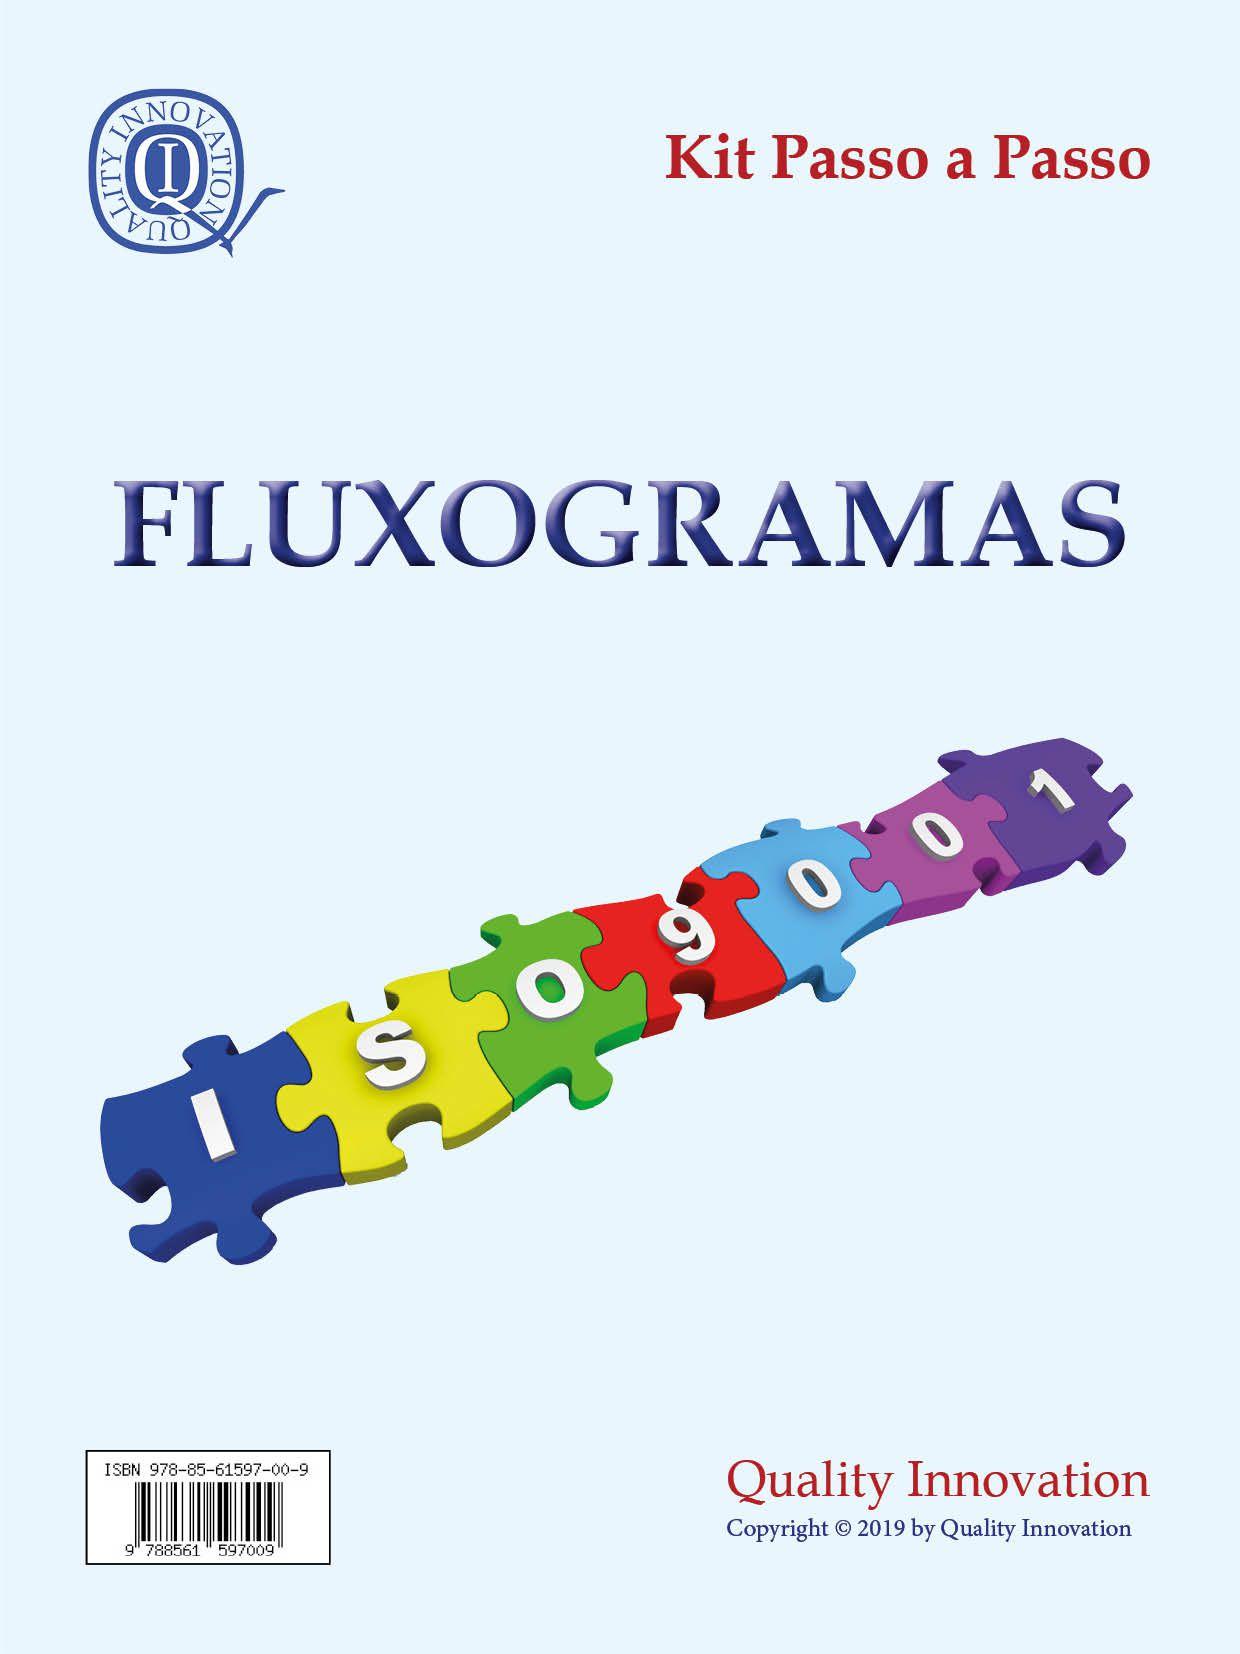 Fluxogramas do SGQ – ISO 9001  - www.qualistore.net.br